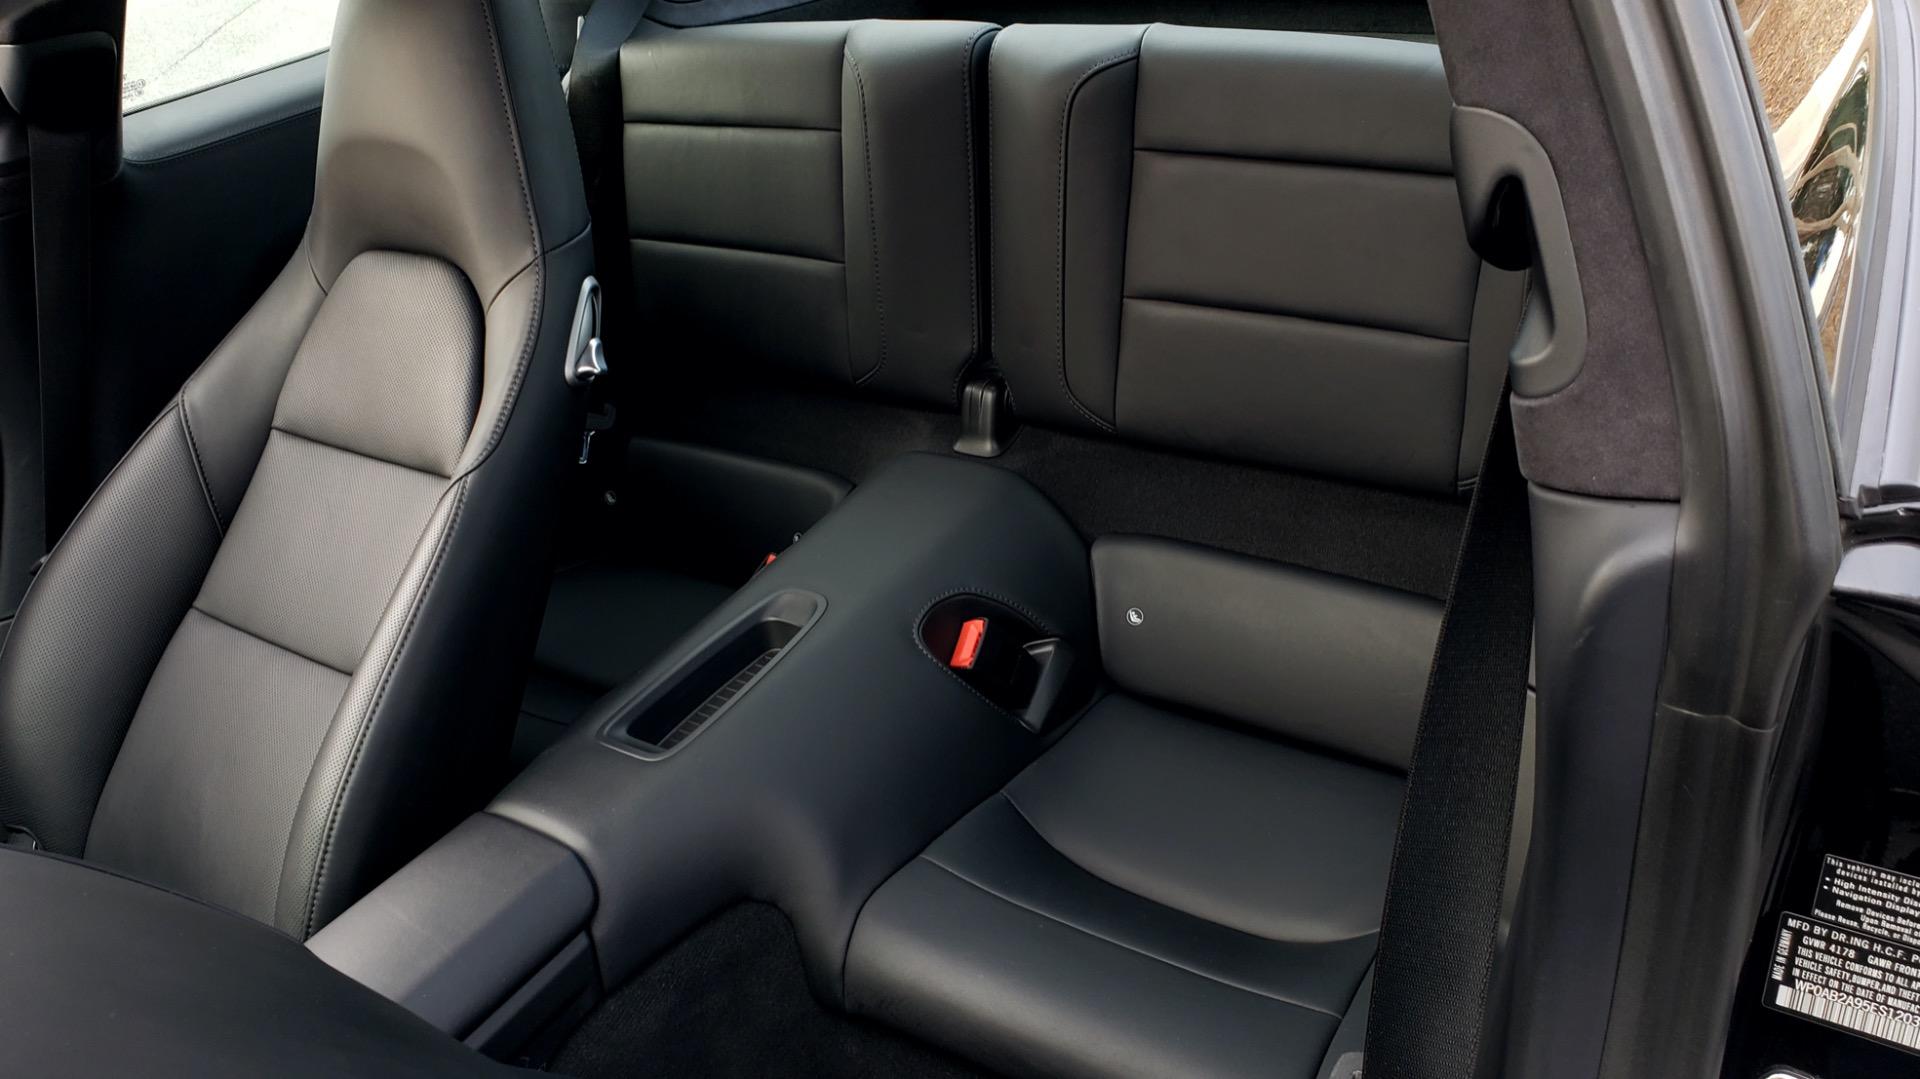 Used 2014 Porsche 911 CARRERA 4S / PREM PKG PLUS / NAV / SUNROO / BOSE / CHRONO for sale Sold at Formula Imports in Charlotte NC 28227 61